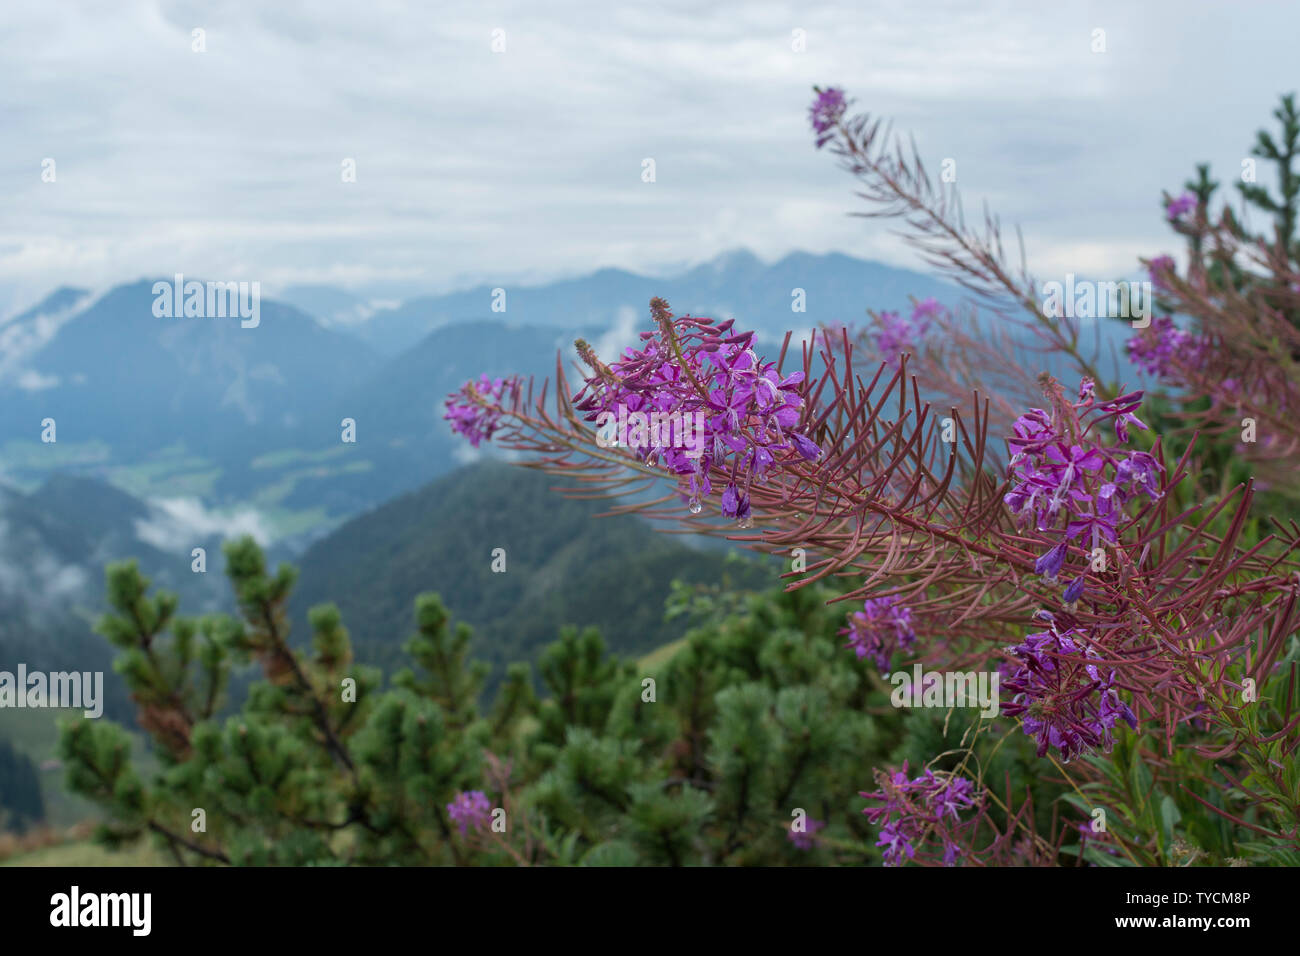 Hochfelln mountain, Hochfelln, Chiemgau, Upper Bavaria, Bavaria, Bavarian Alps, Germany - Stock Image